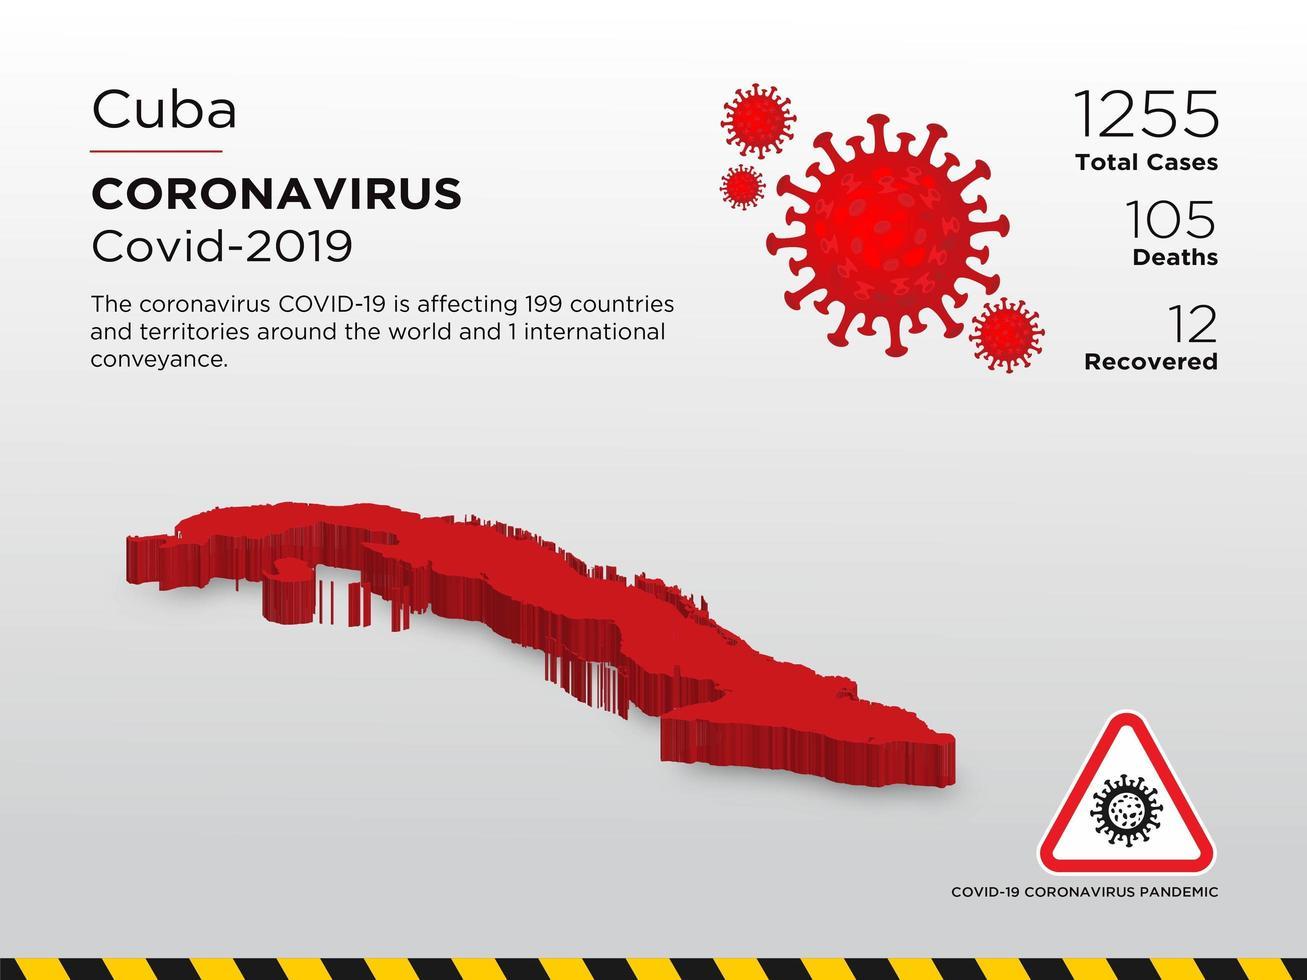 mapa del país afectado por coronavirus en cuba vector